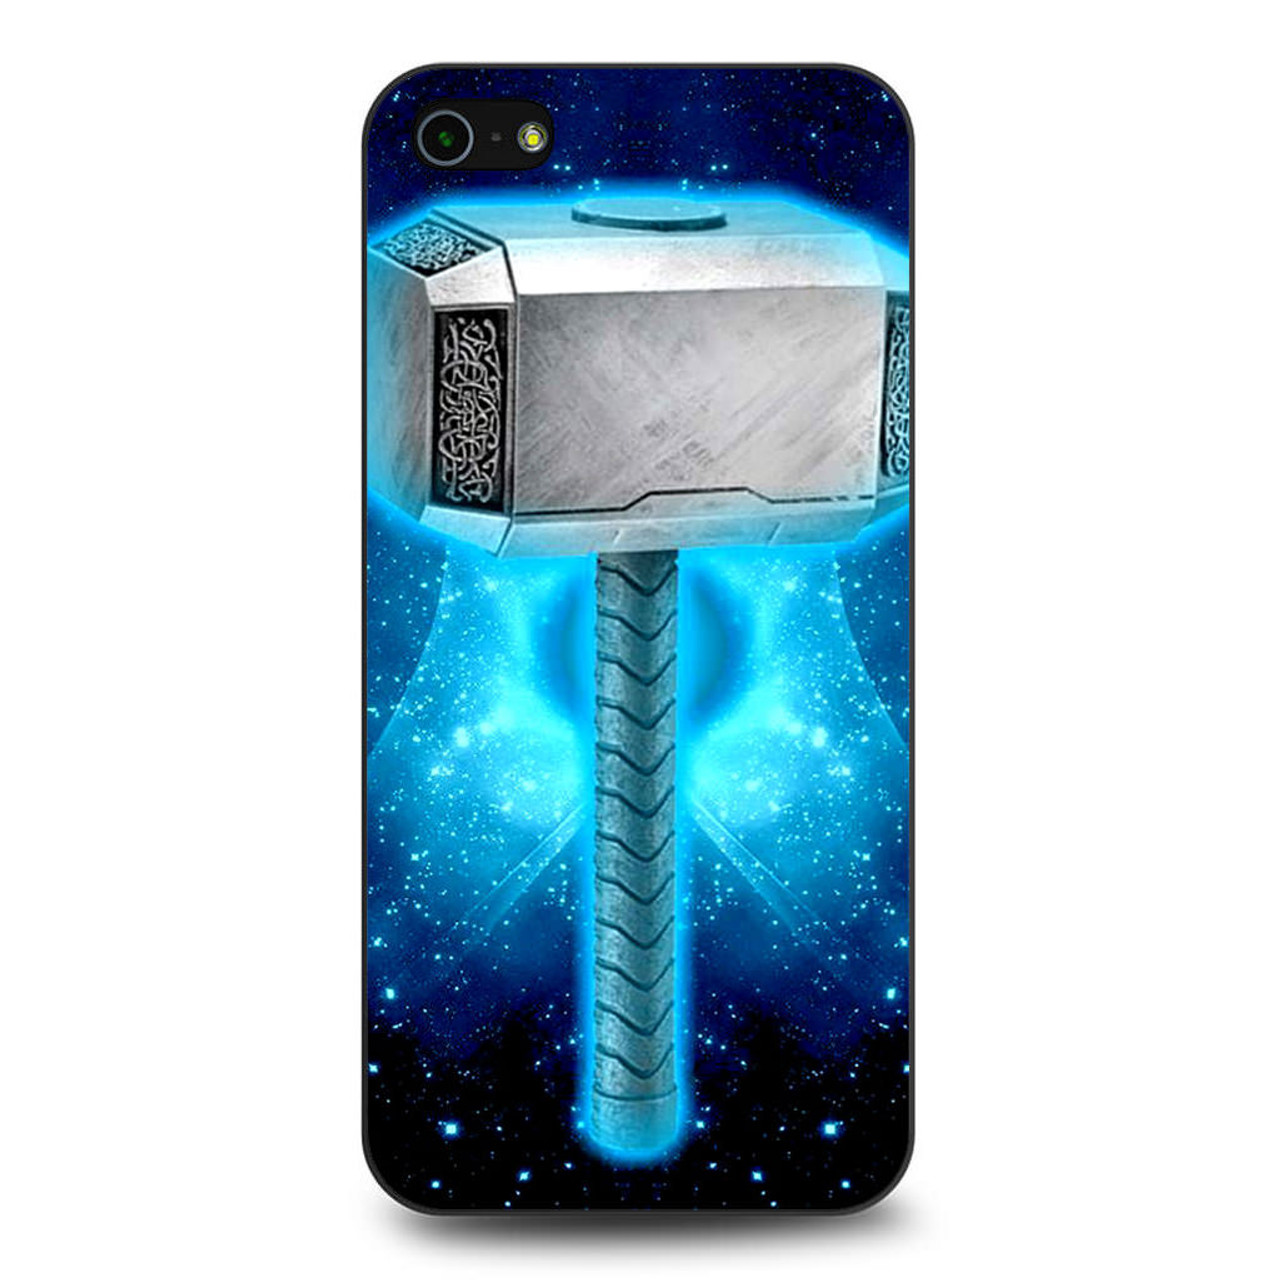 brand new a399a c5ffd Mjolnir Thor Hammer iPhone 5/5S/SE Case